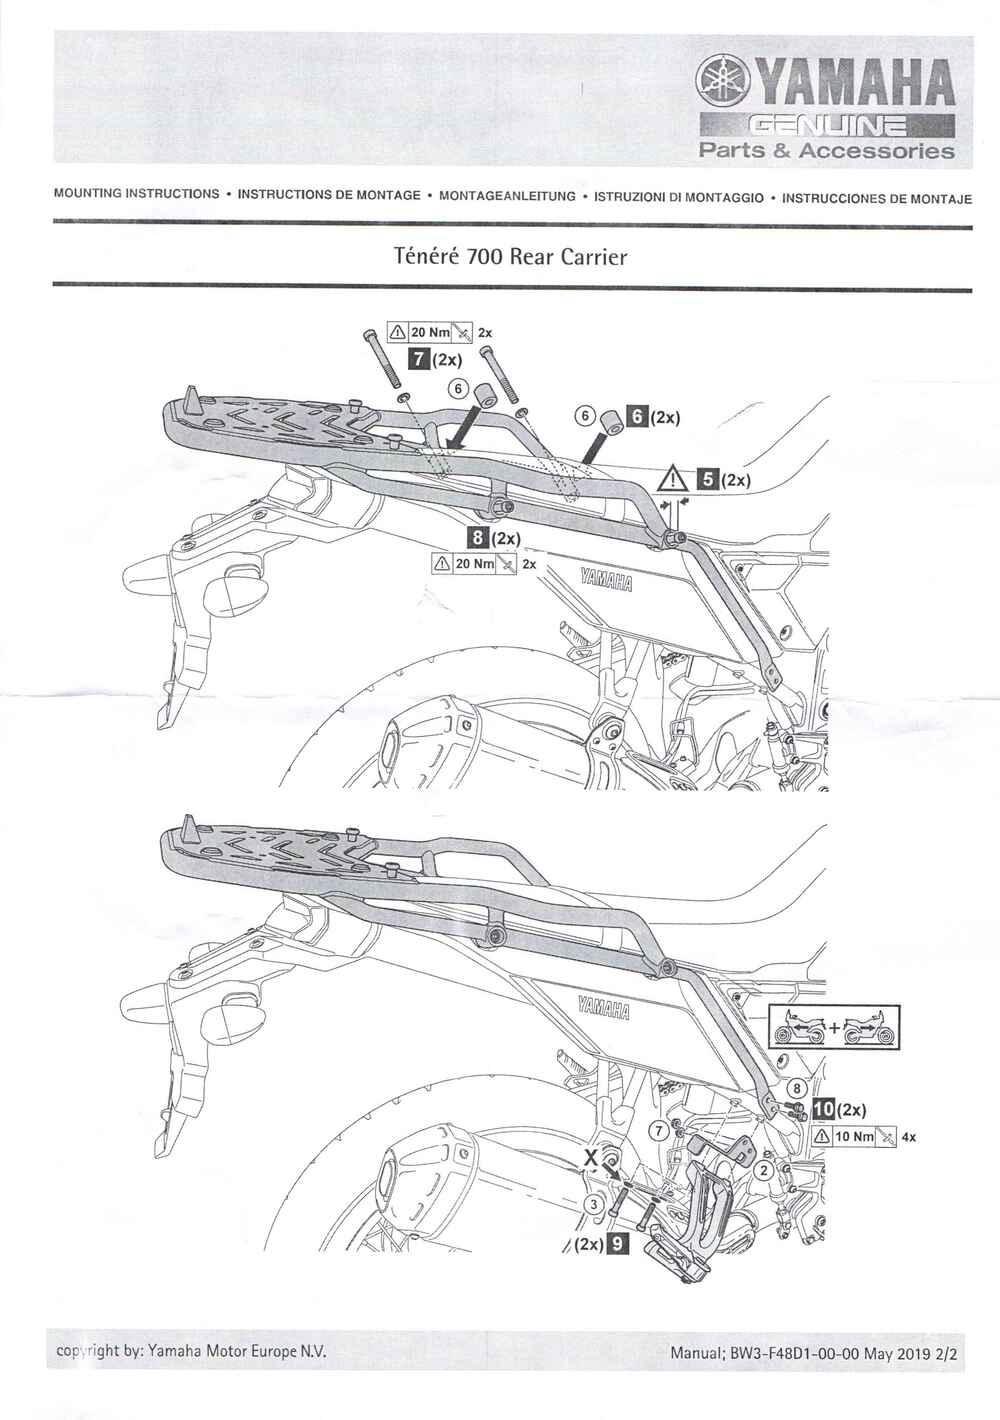 Montageanleitung Gepäckträger Tenere 700